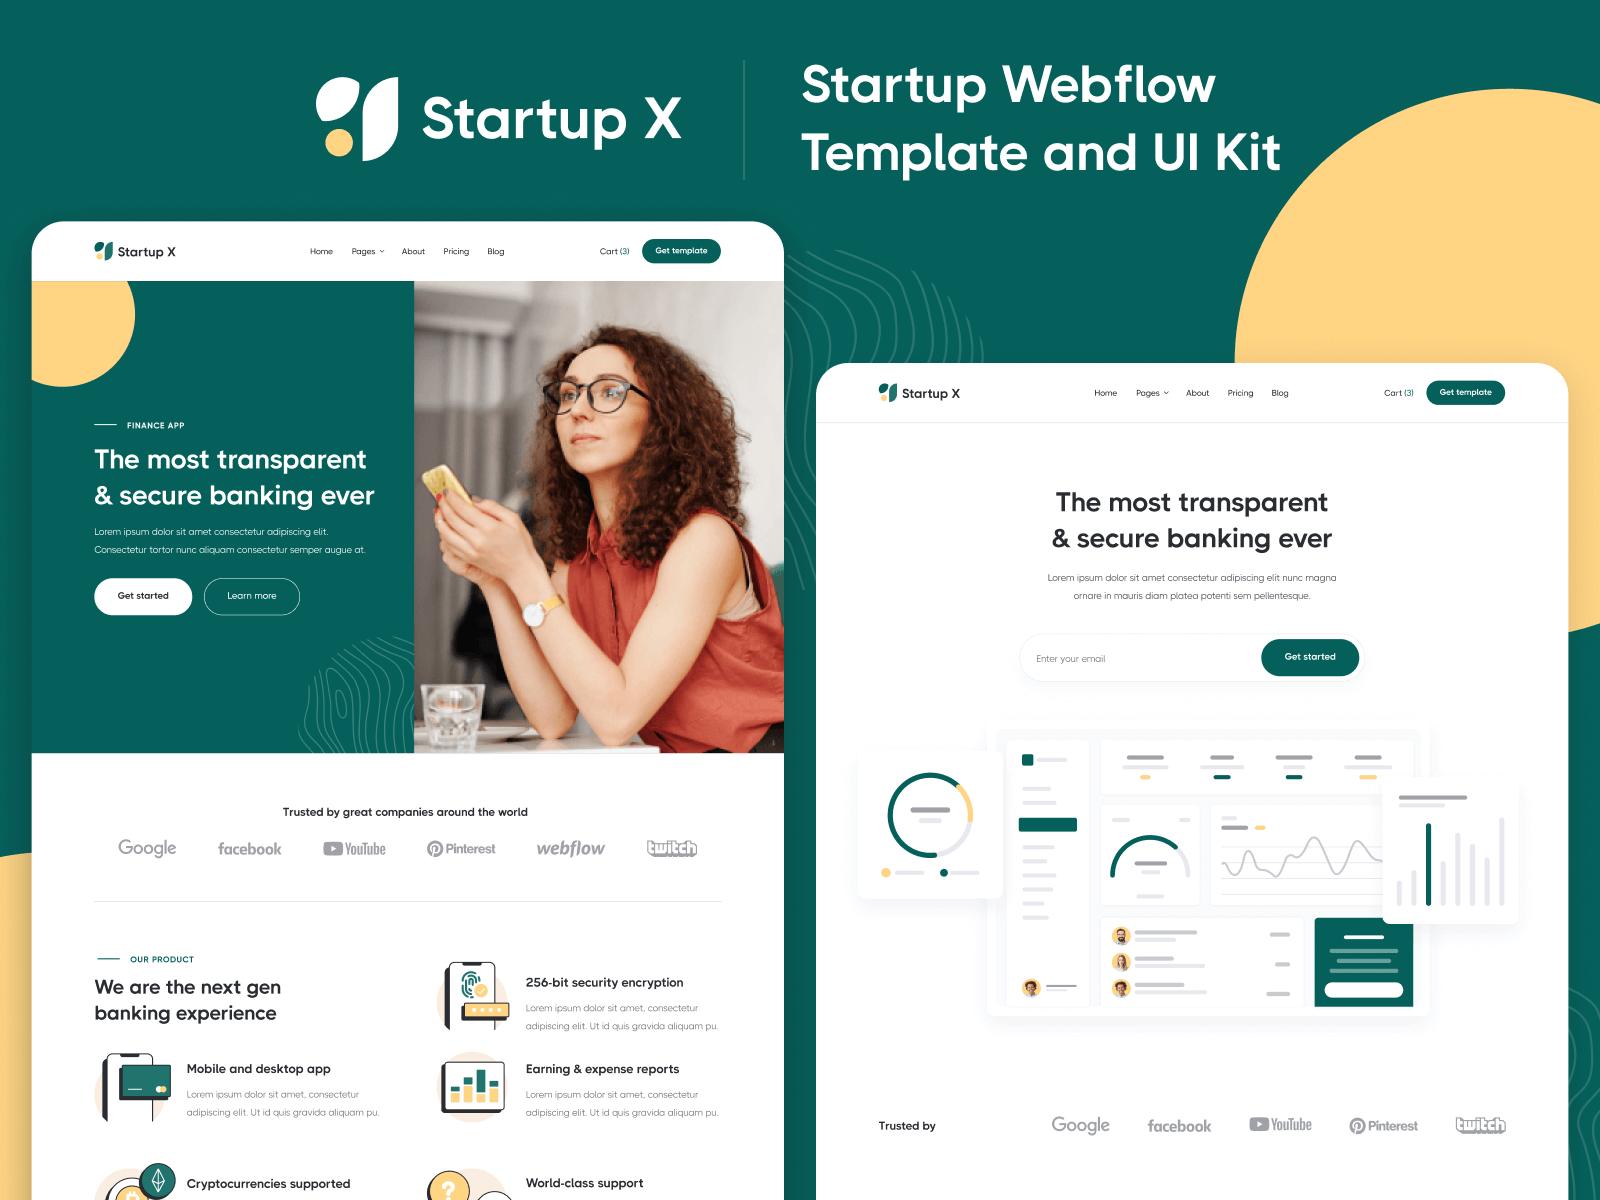 Startup Webflow Template